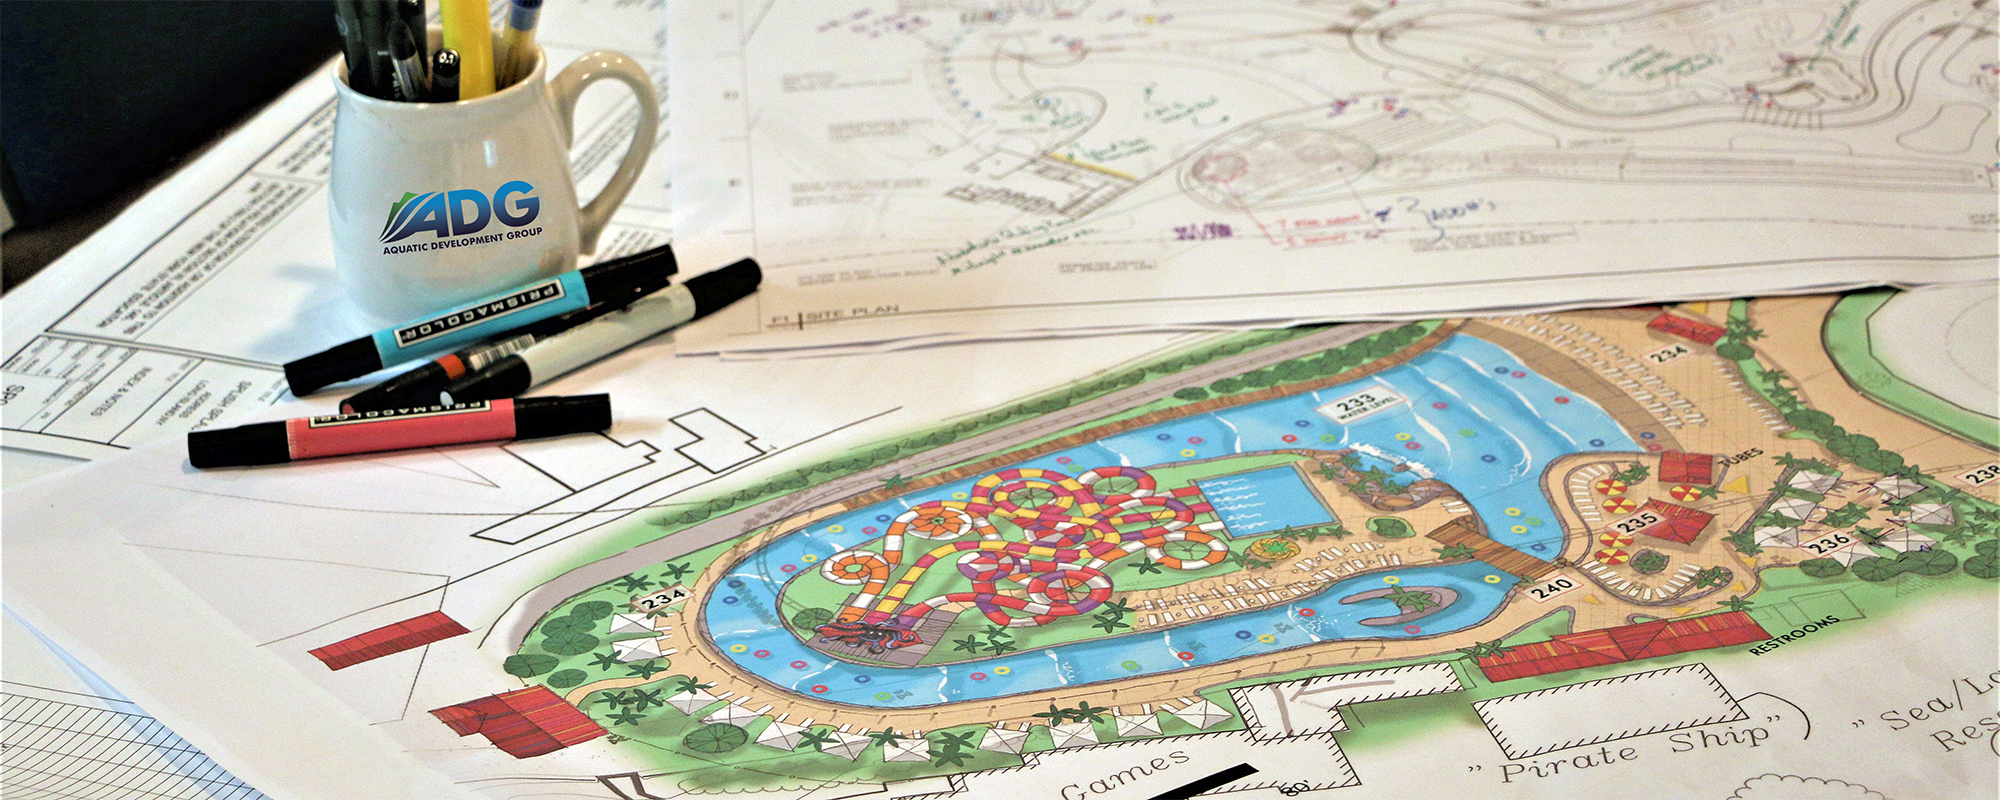 water park concept adg